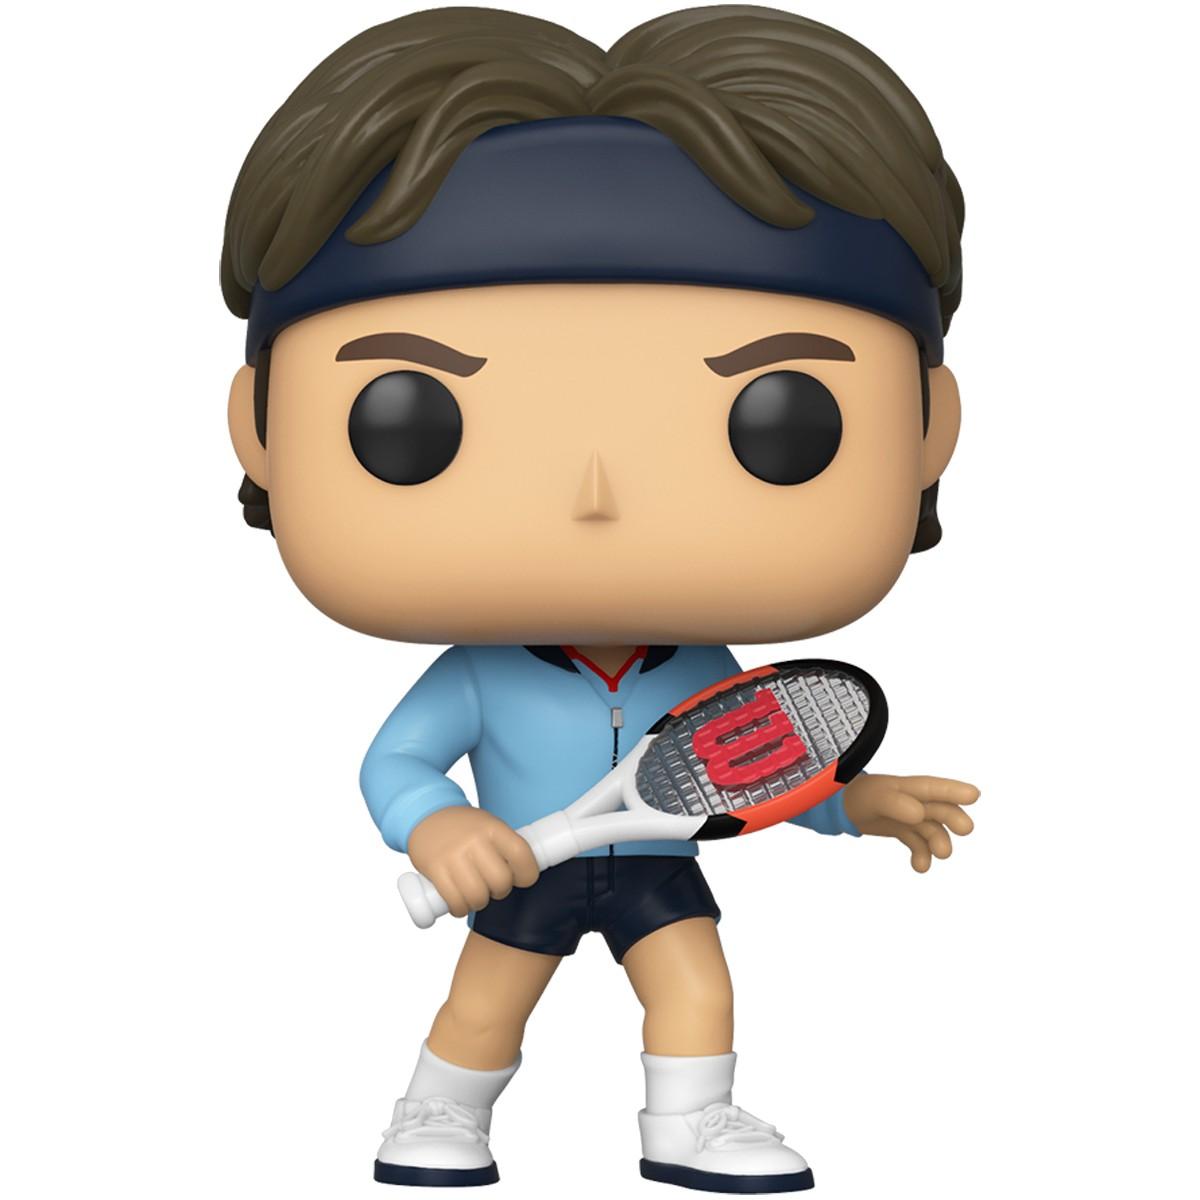 Figurine Federer